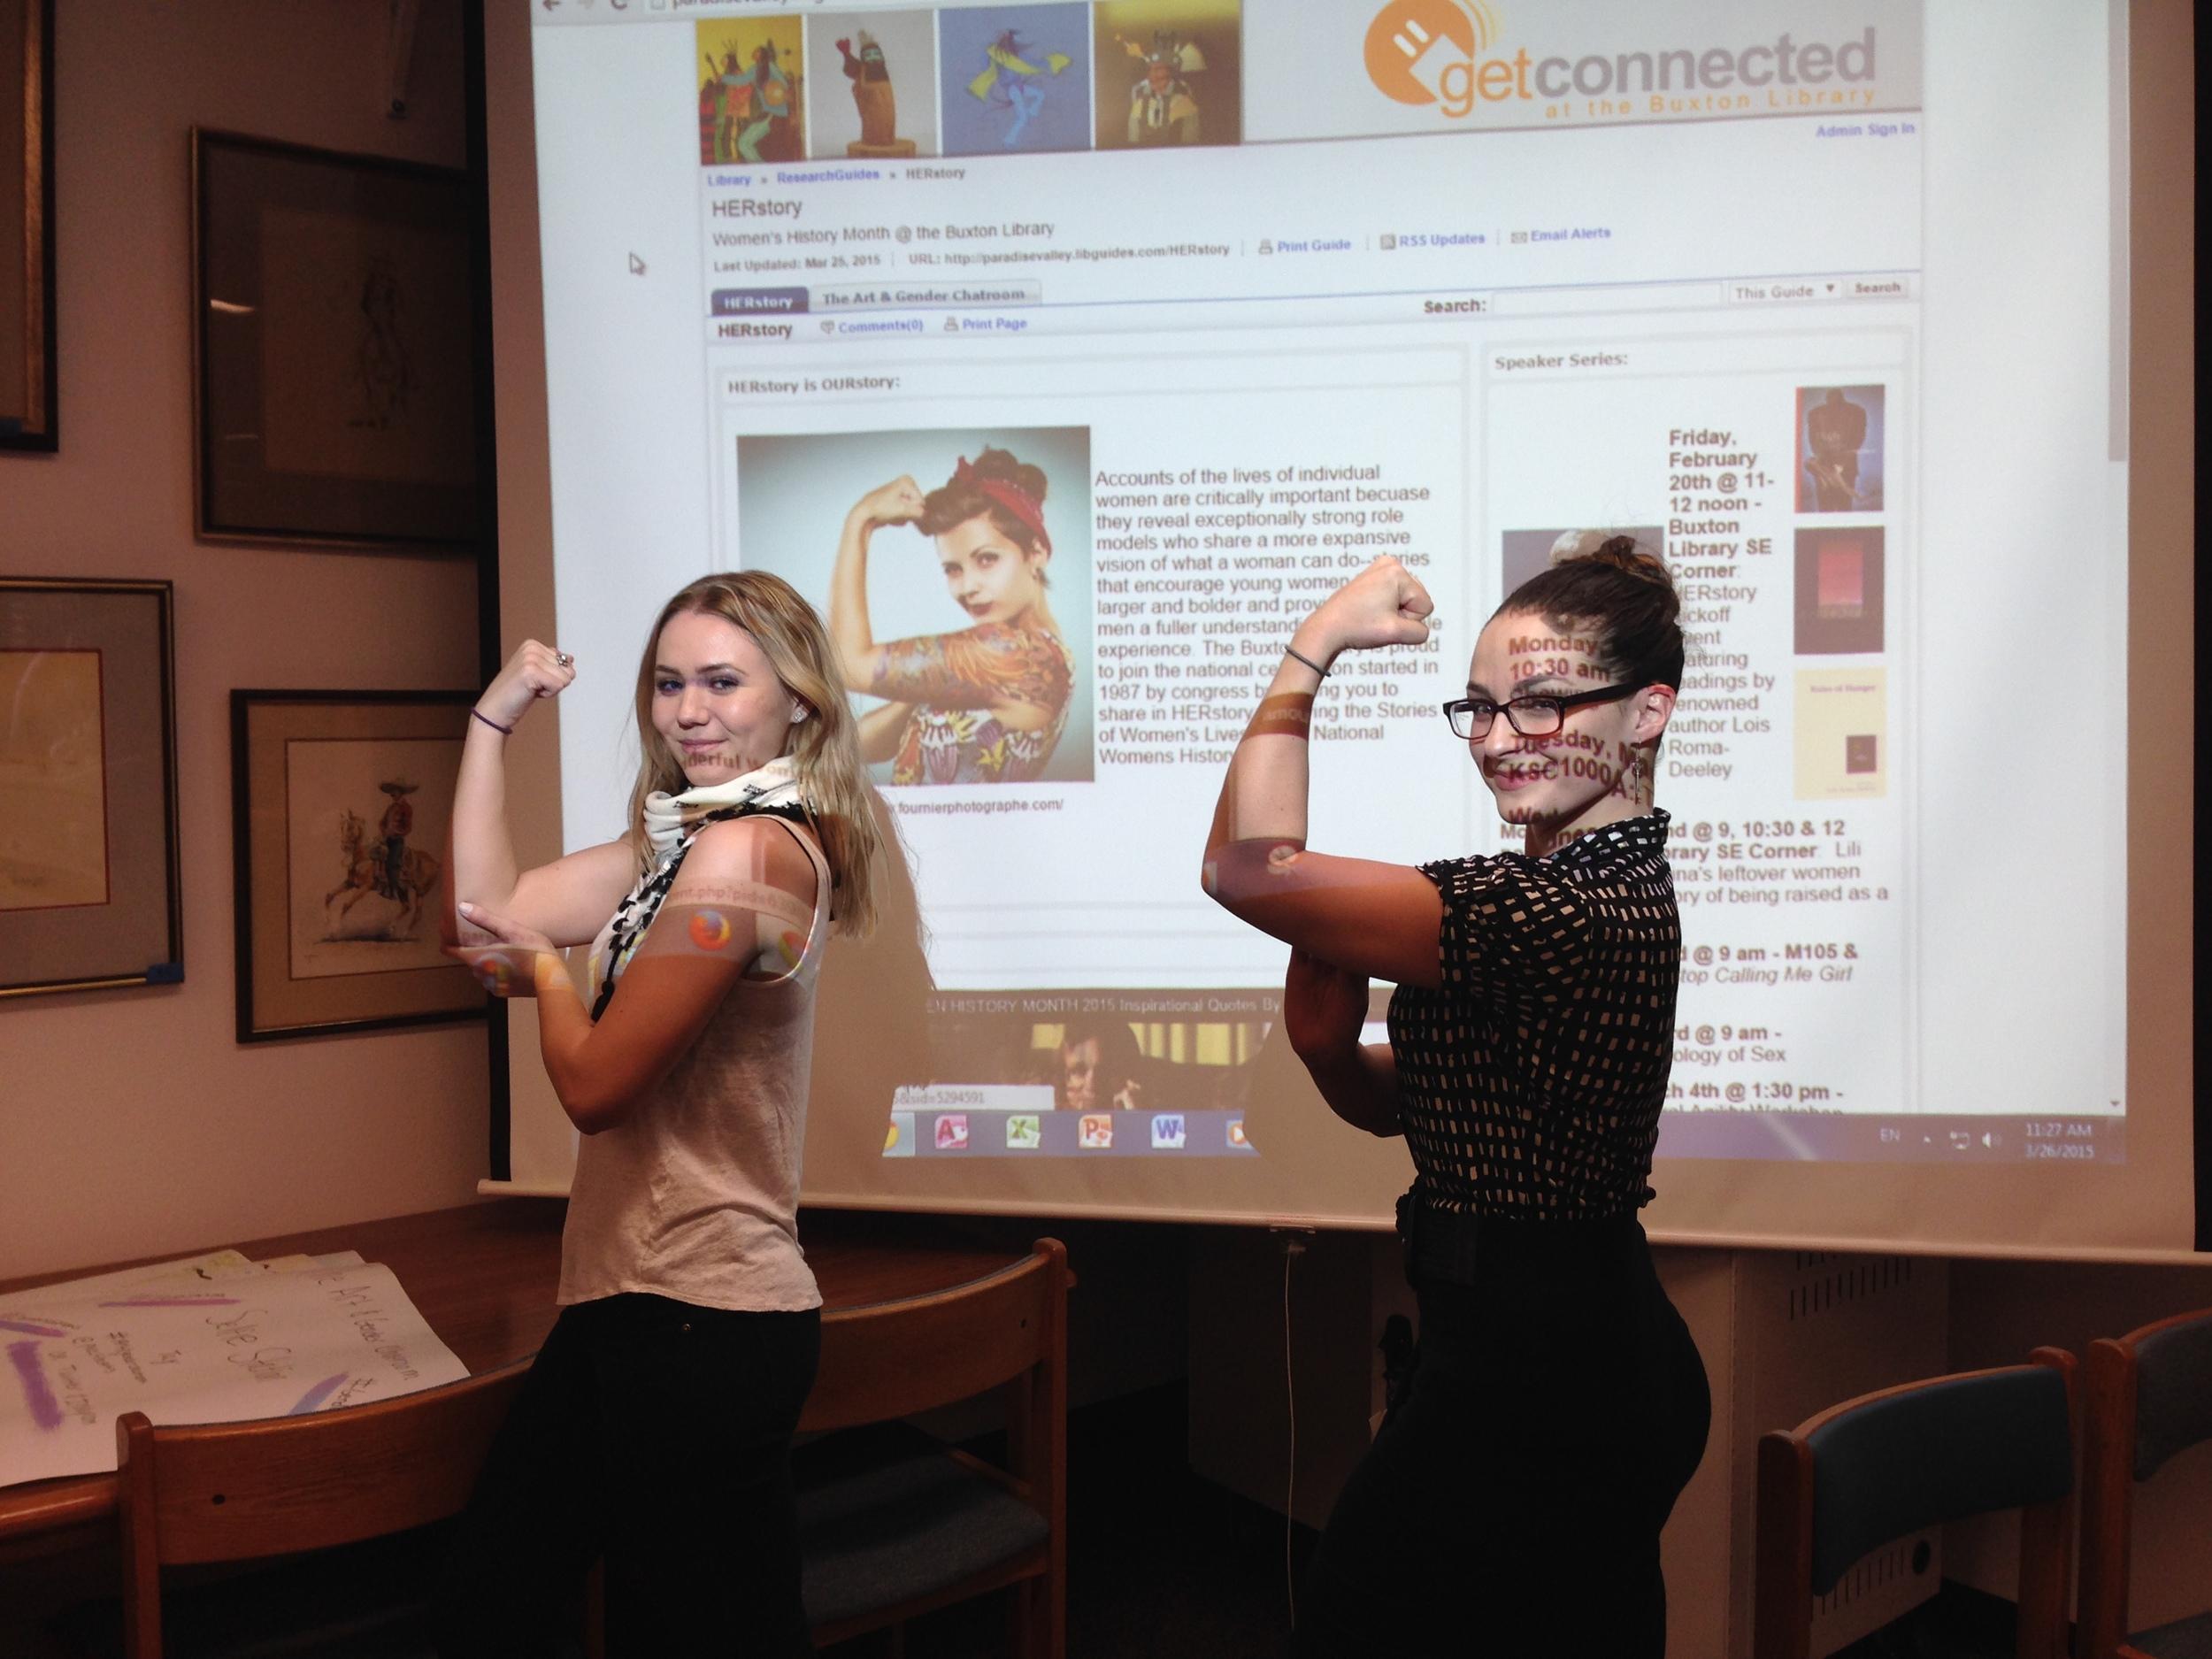 PVCC students Katlynn McNab and Heidi Klotz pose in front of Kande Mickelsen's HERstory blog.